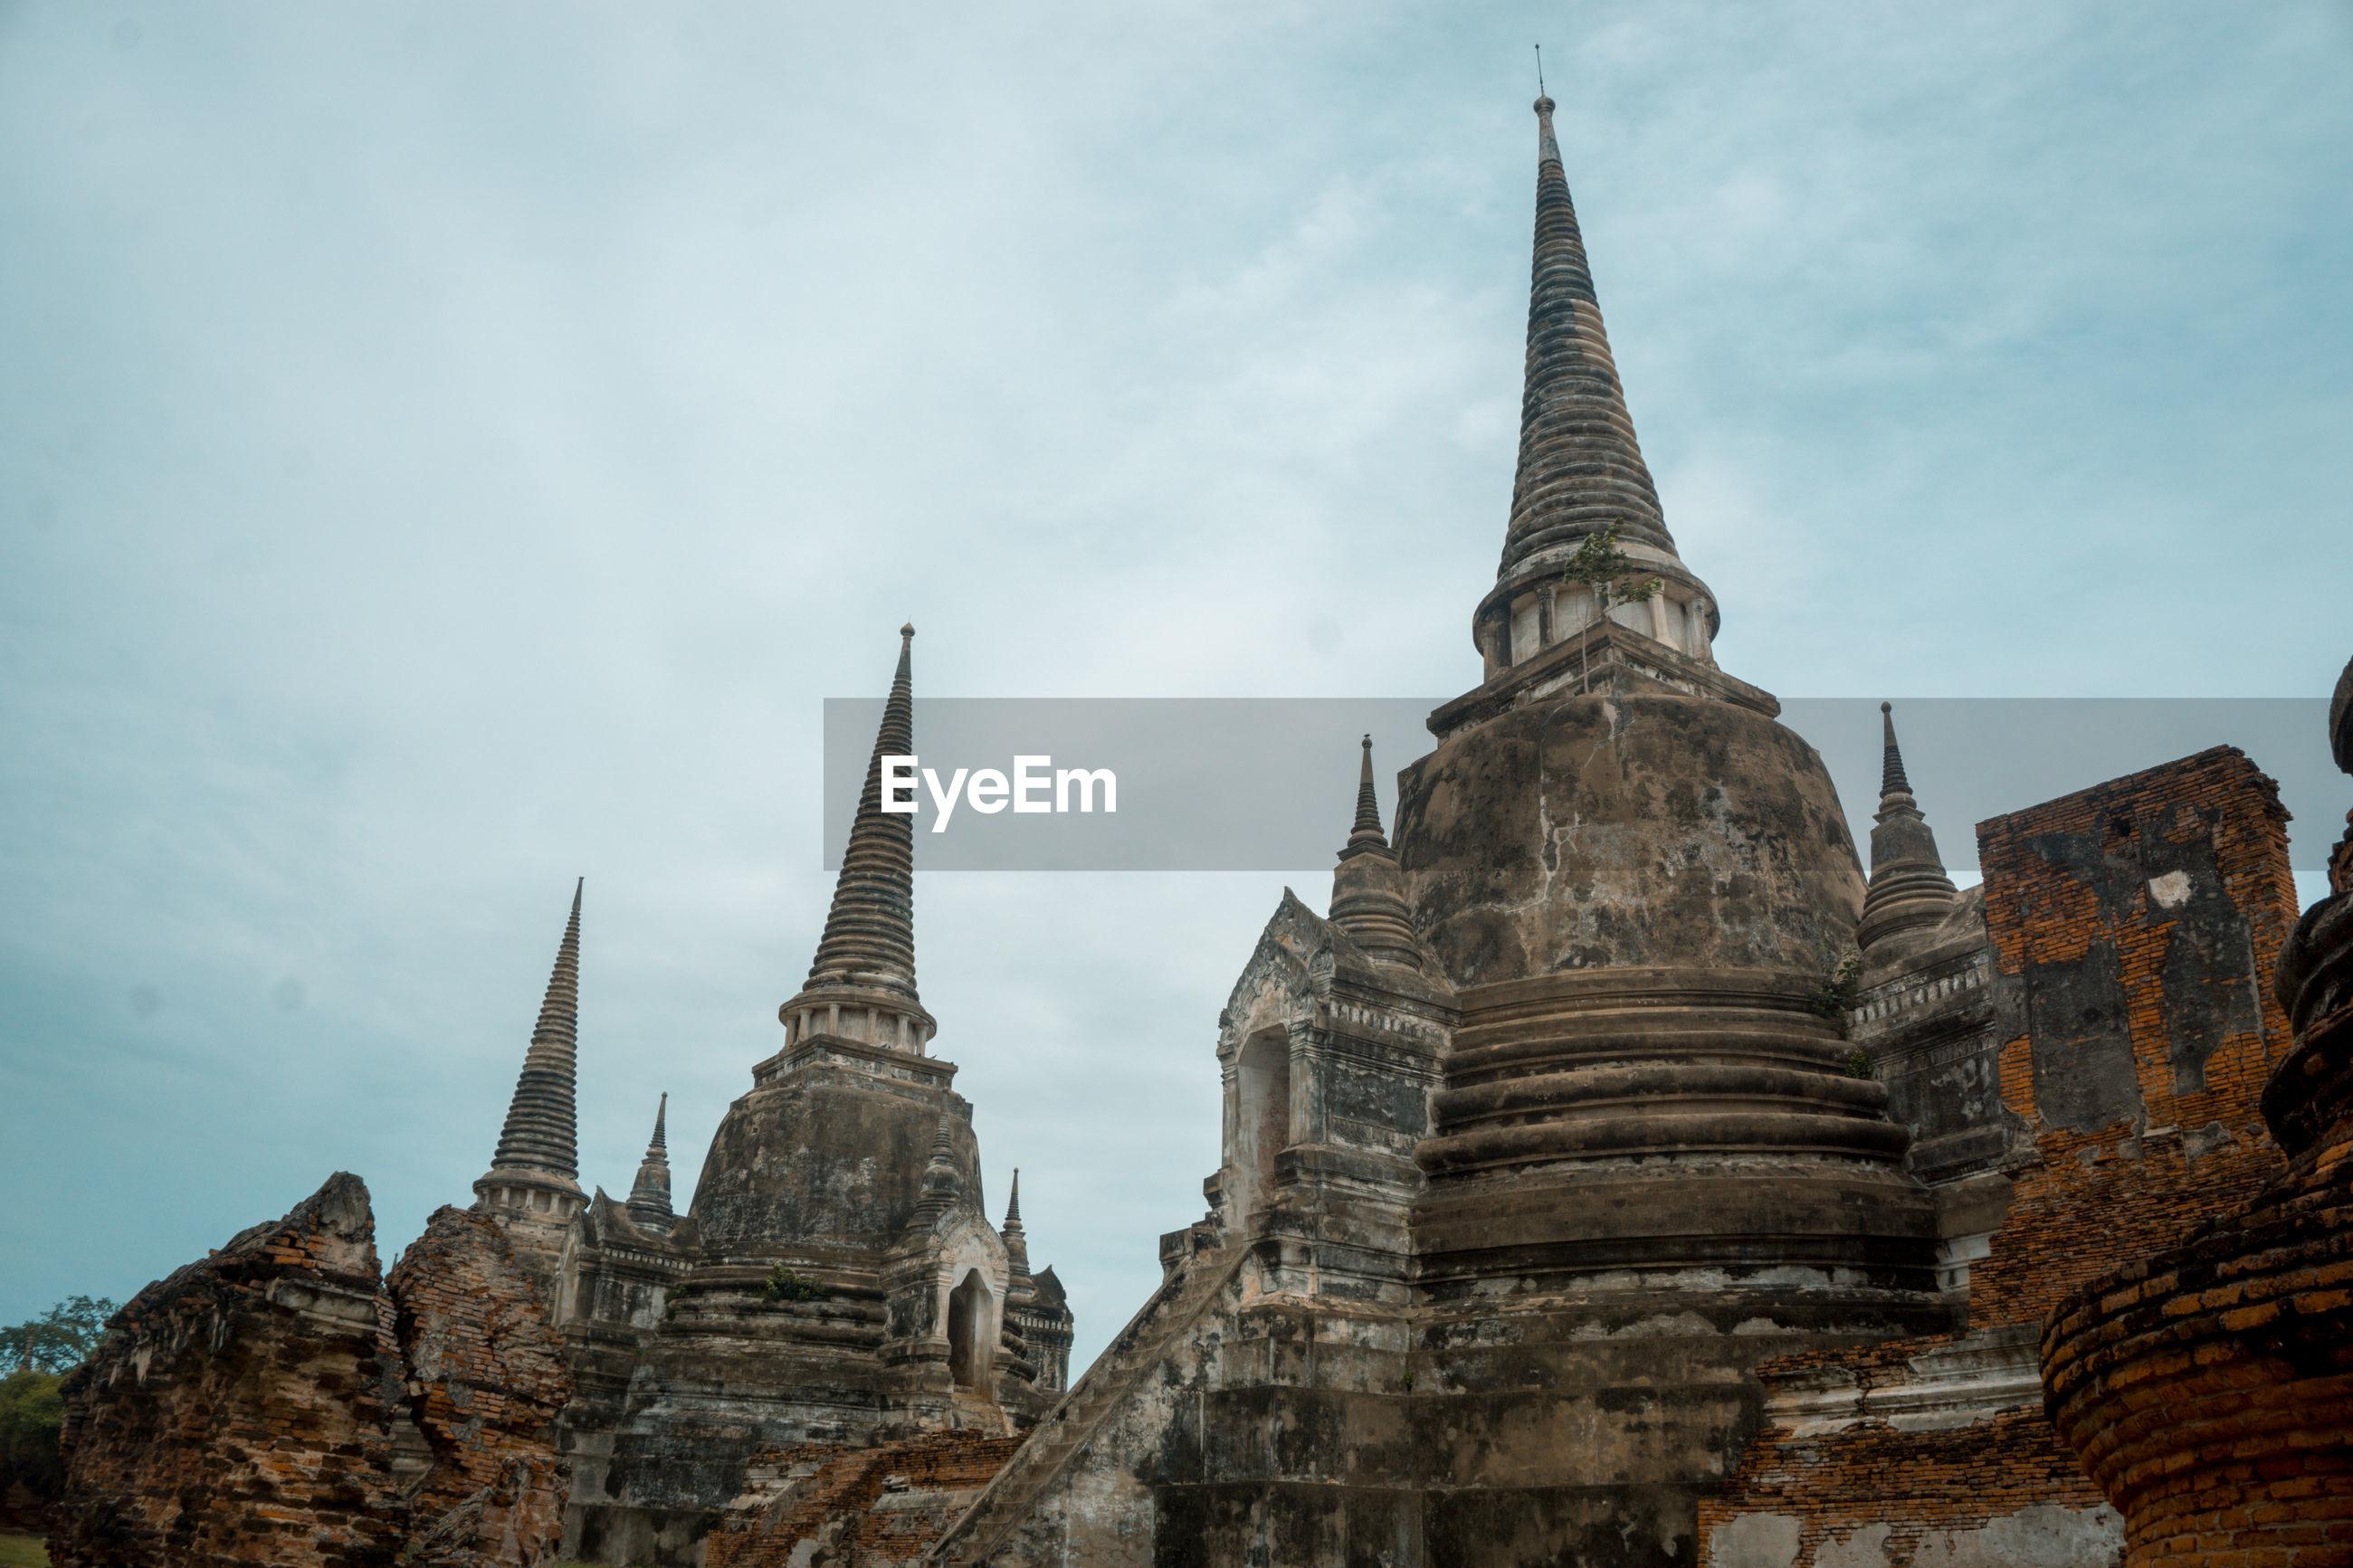 Stupas of a building